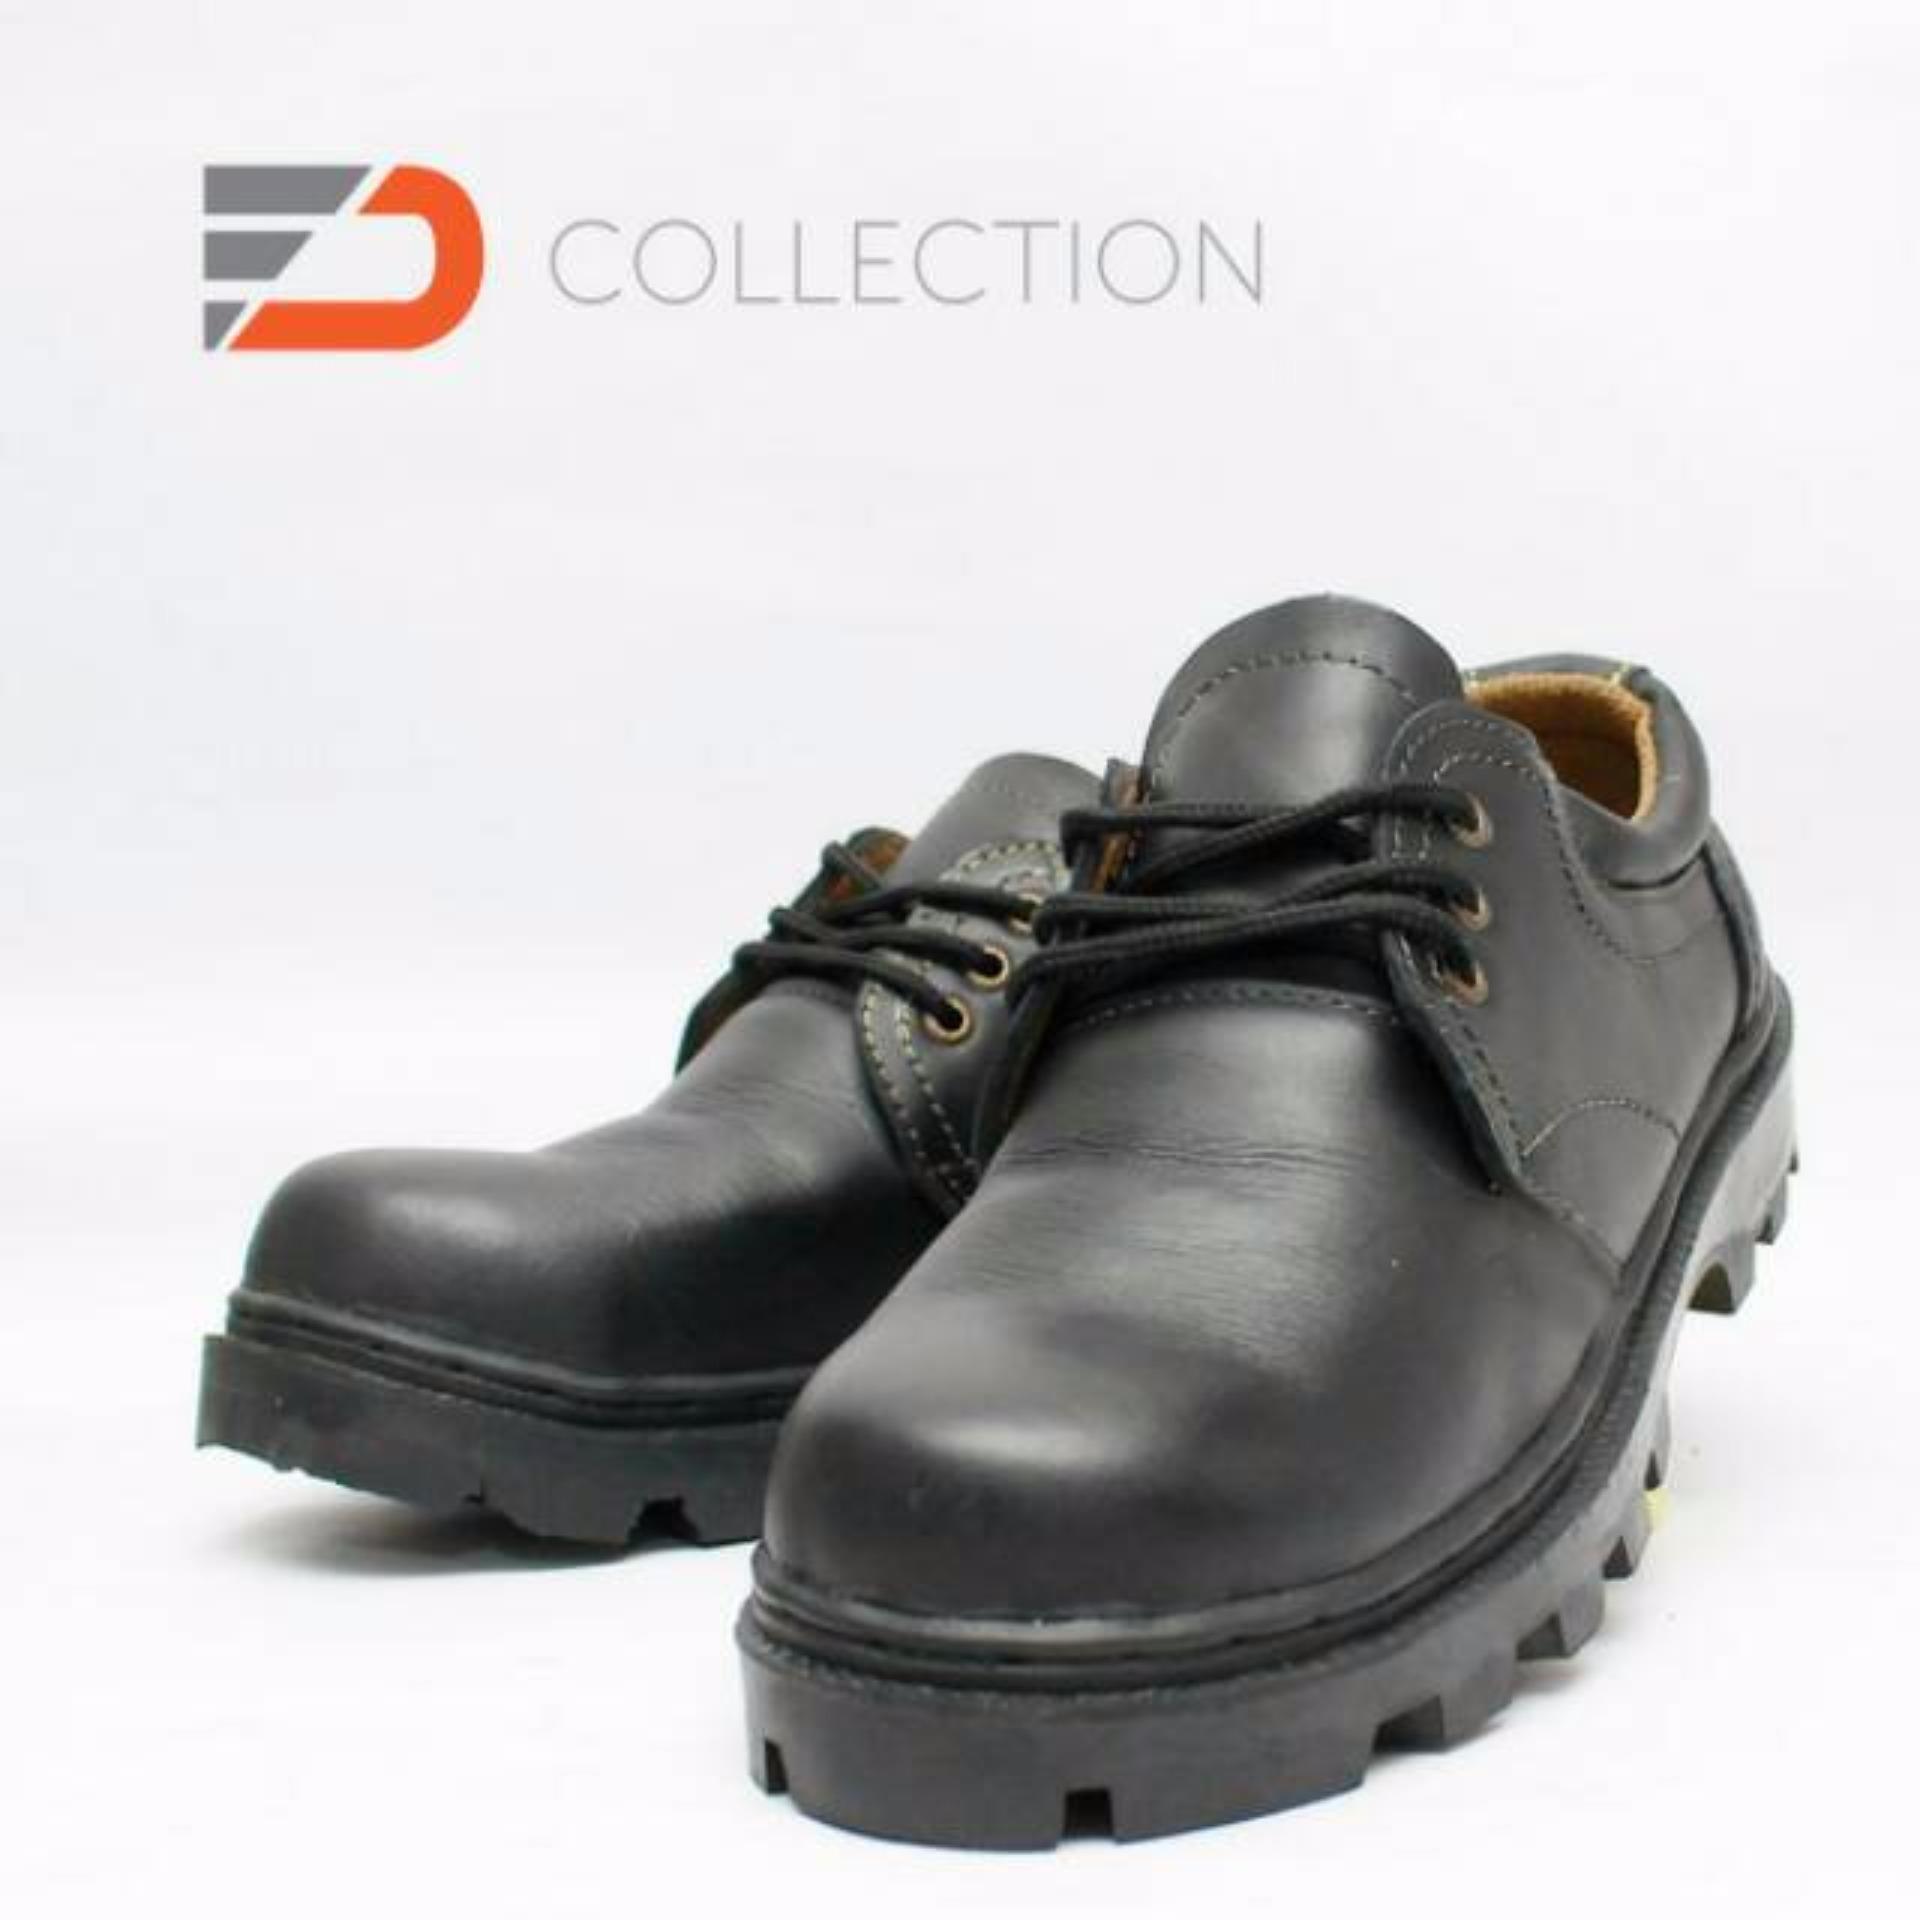 Sepatu Safety Boots Kulit Sapi Asli Fd 5 Daftar Harga Terkini Dan Selop Bahan Kukit 1 Pendek Hitam